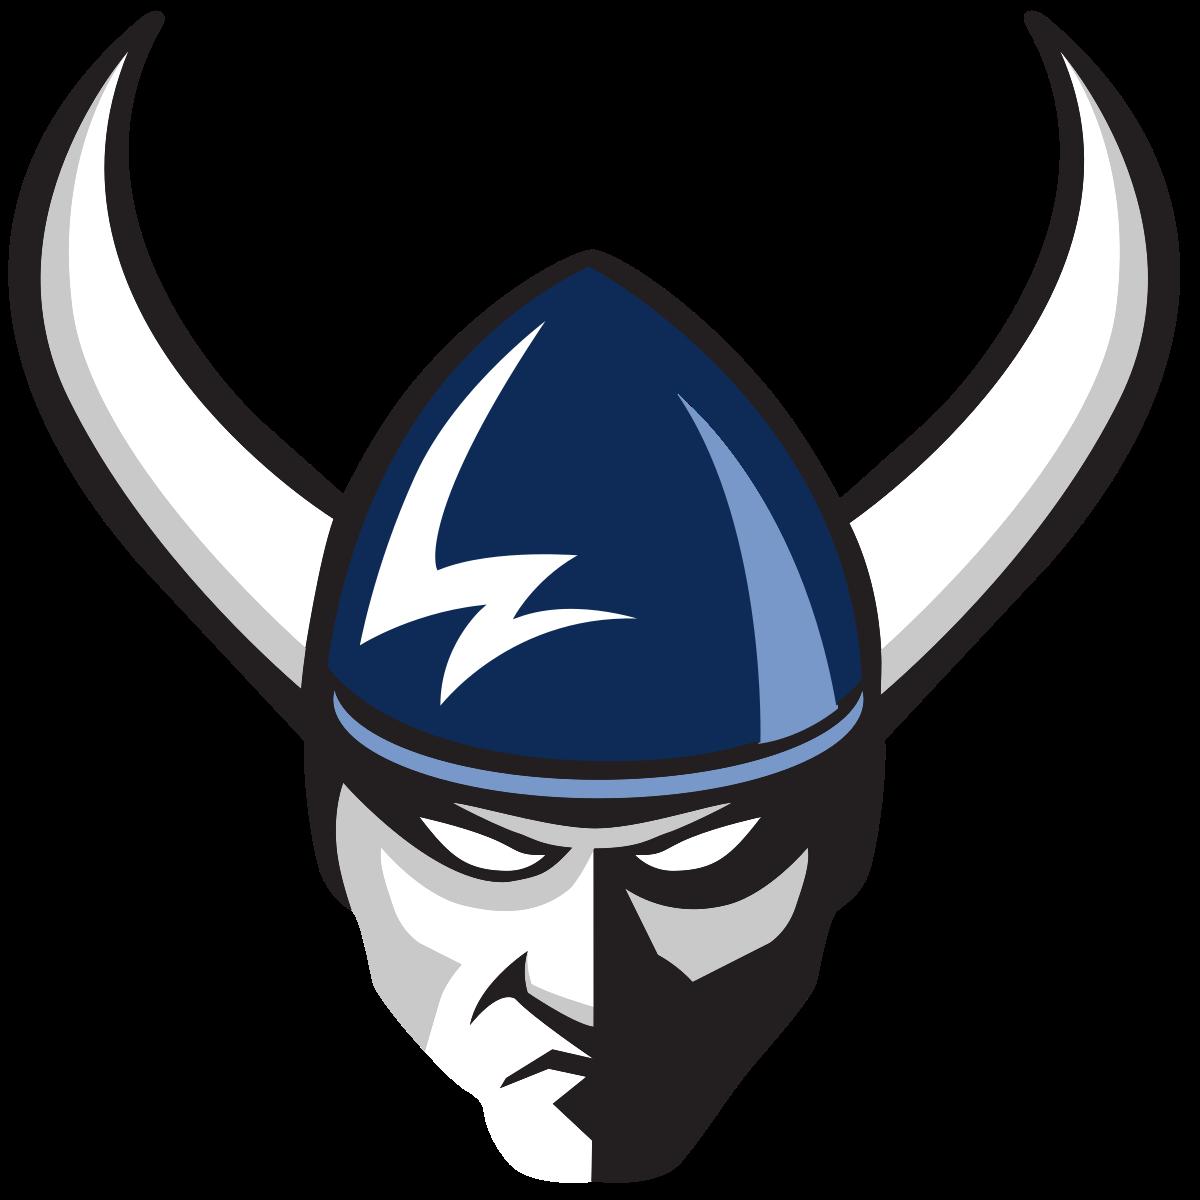 University of washington mascot clipart vector free library Western Washington Vikings - Wikipedia vector free library